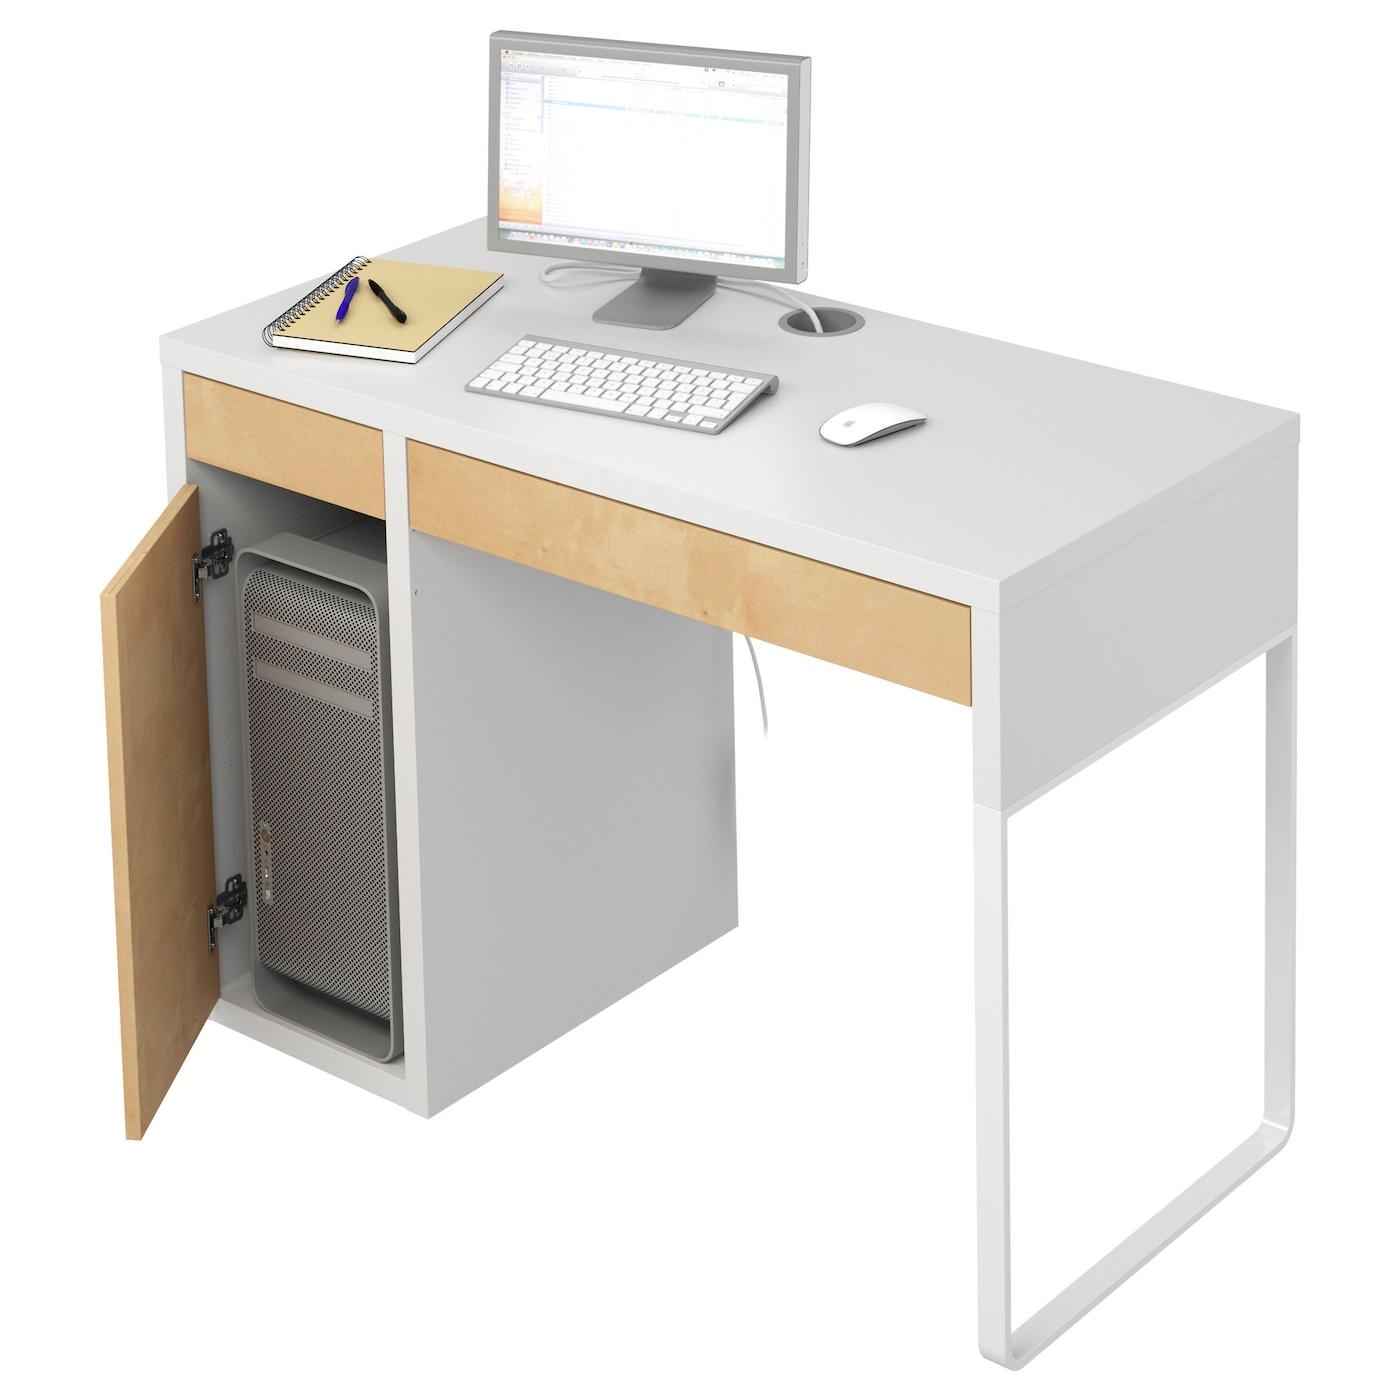 micke bureau wit berkenpatroon 105x50 cm ikea. Black Bedroom Furniture Sets. Home Design Ideas